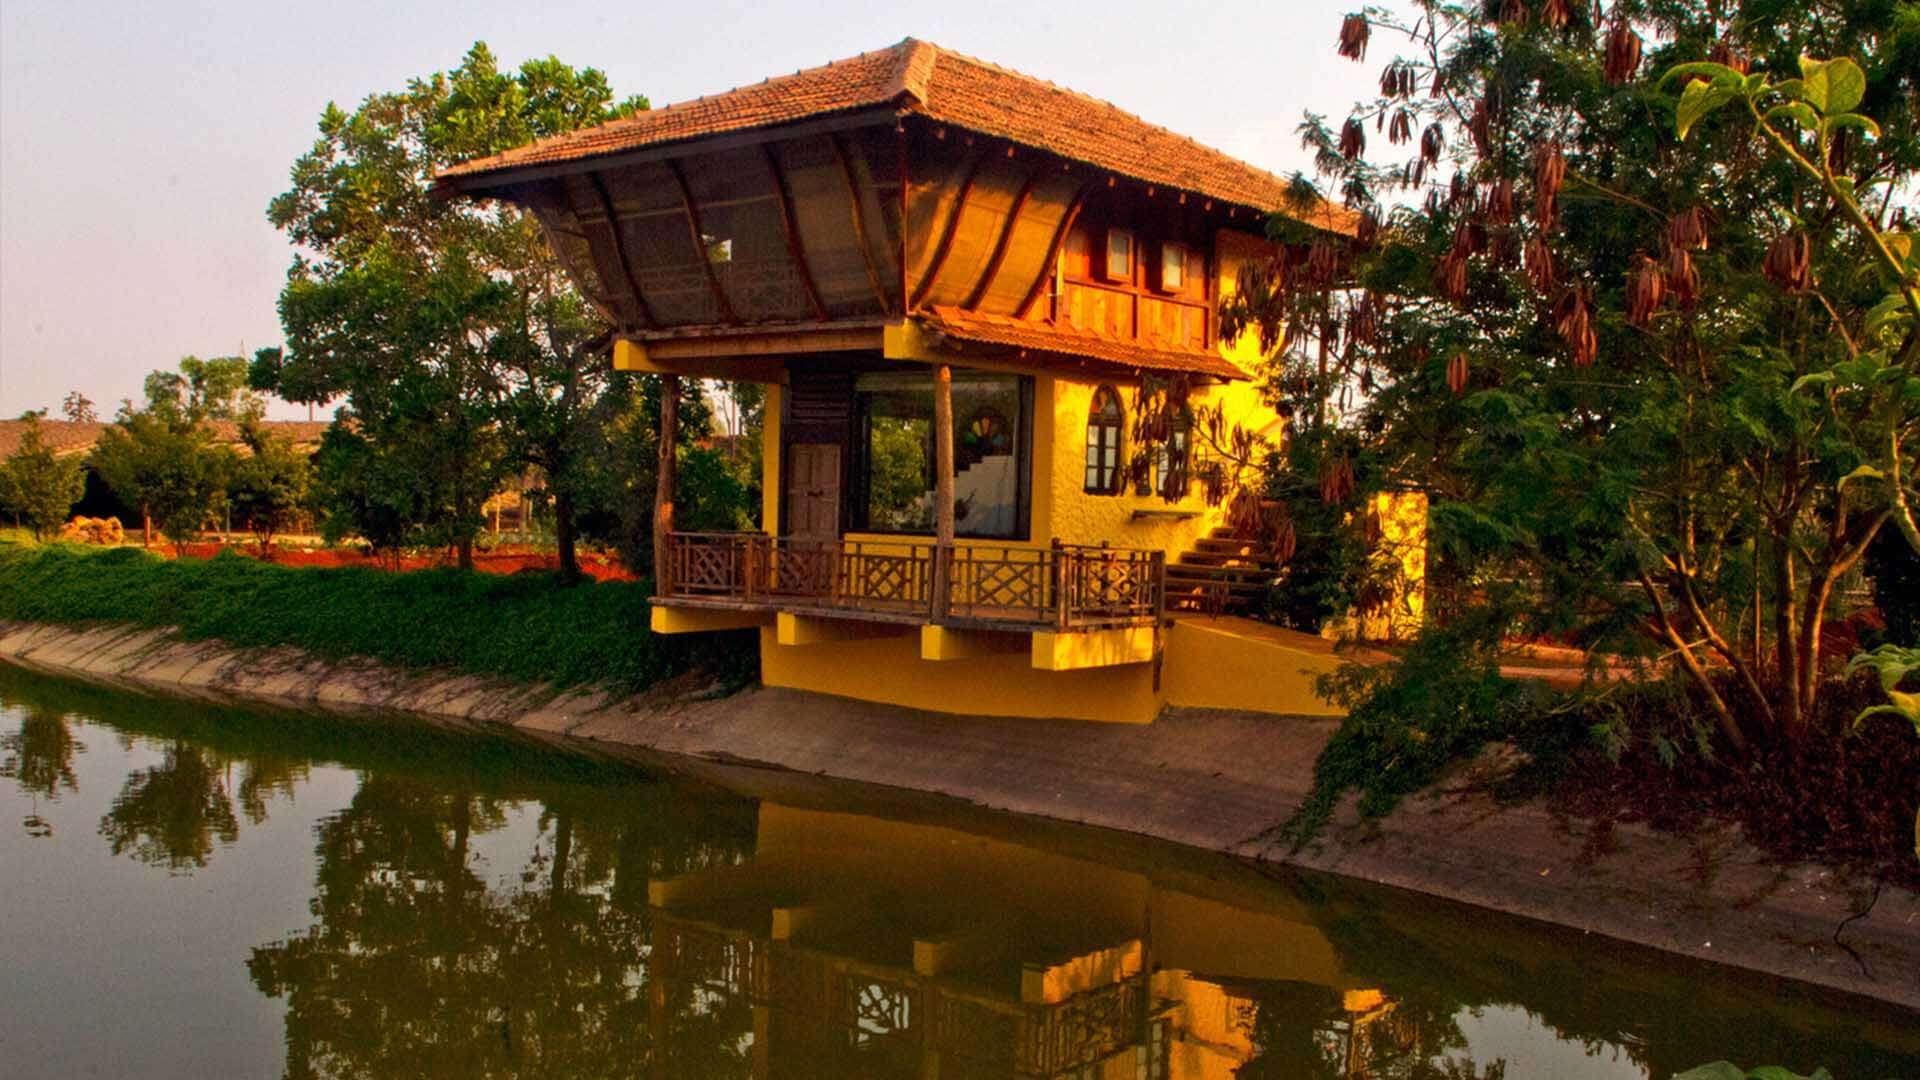 Sankalp Bhumi resort in Belgaum